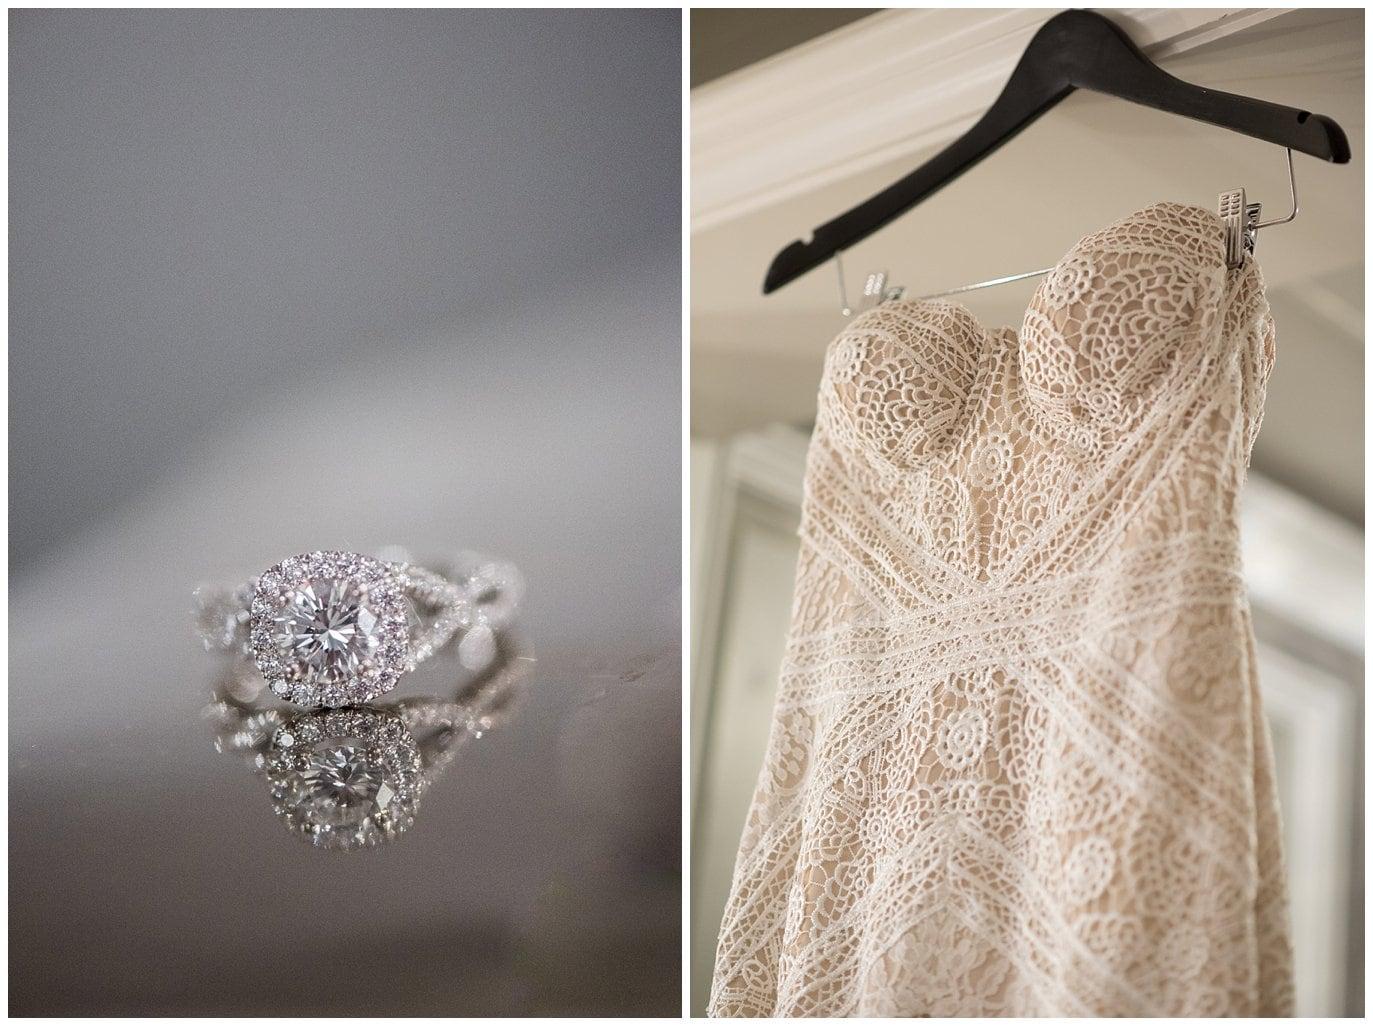 diamond engagement ring and lace wedding dress photo